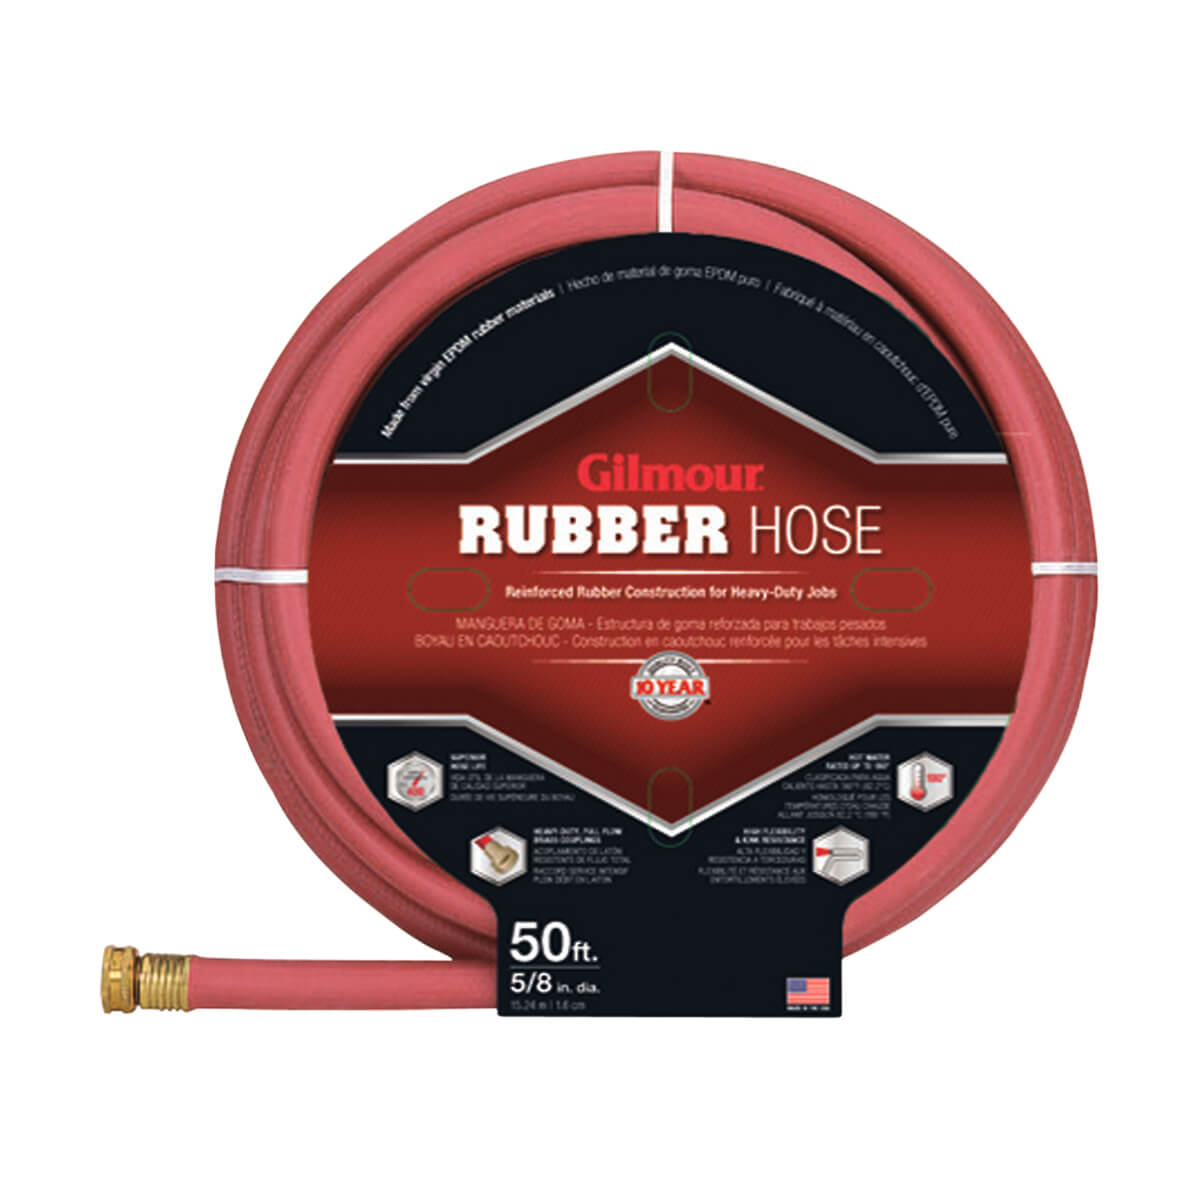 "Gilmour 5/8"" x 50' Rubber Hose"